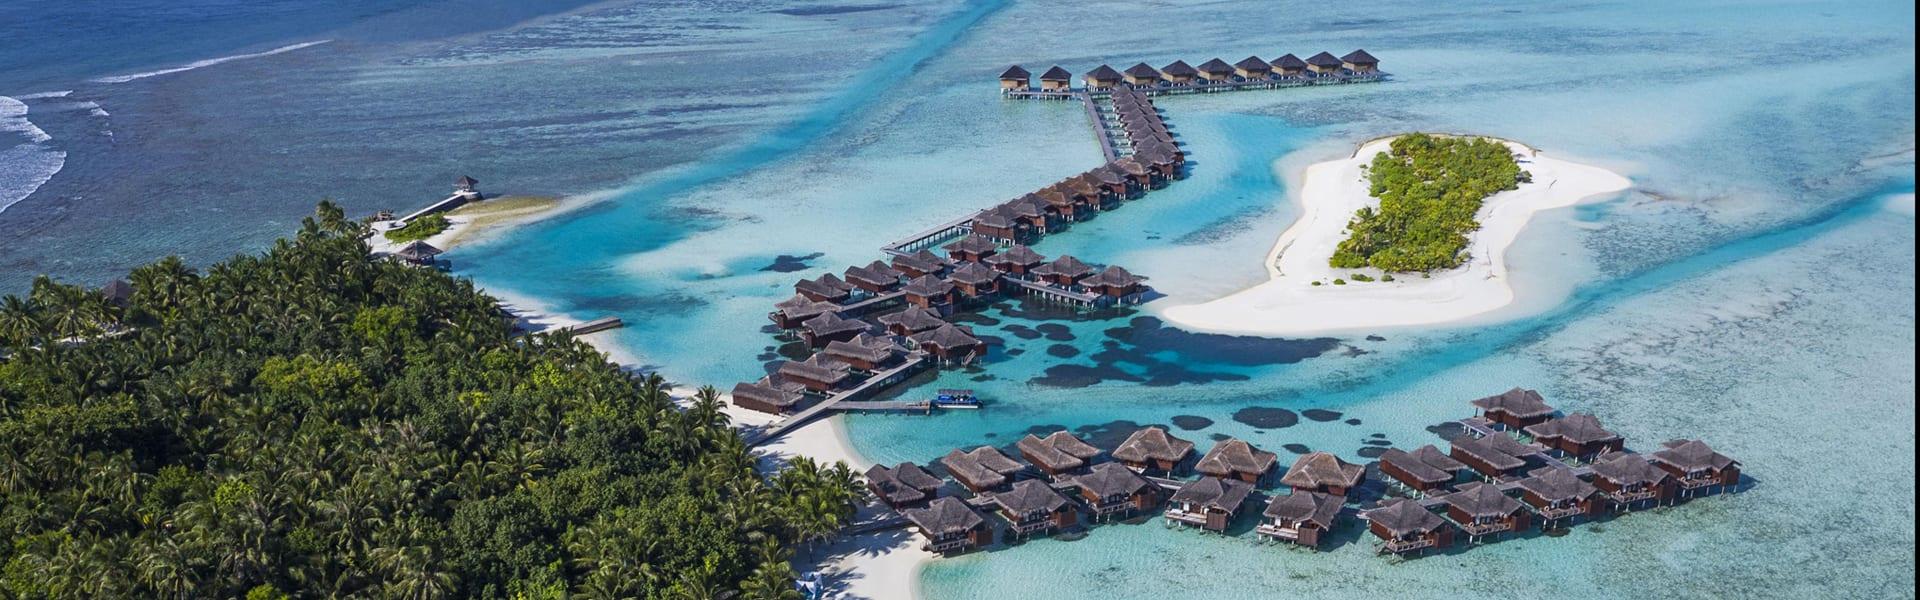 "Maldives ""Unlimited"" Stay $30,000.00"